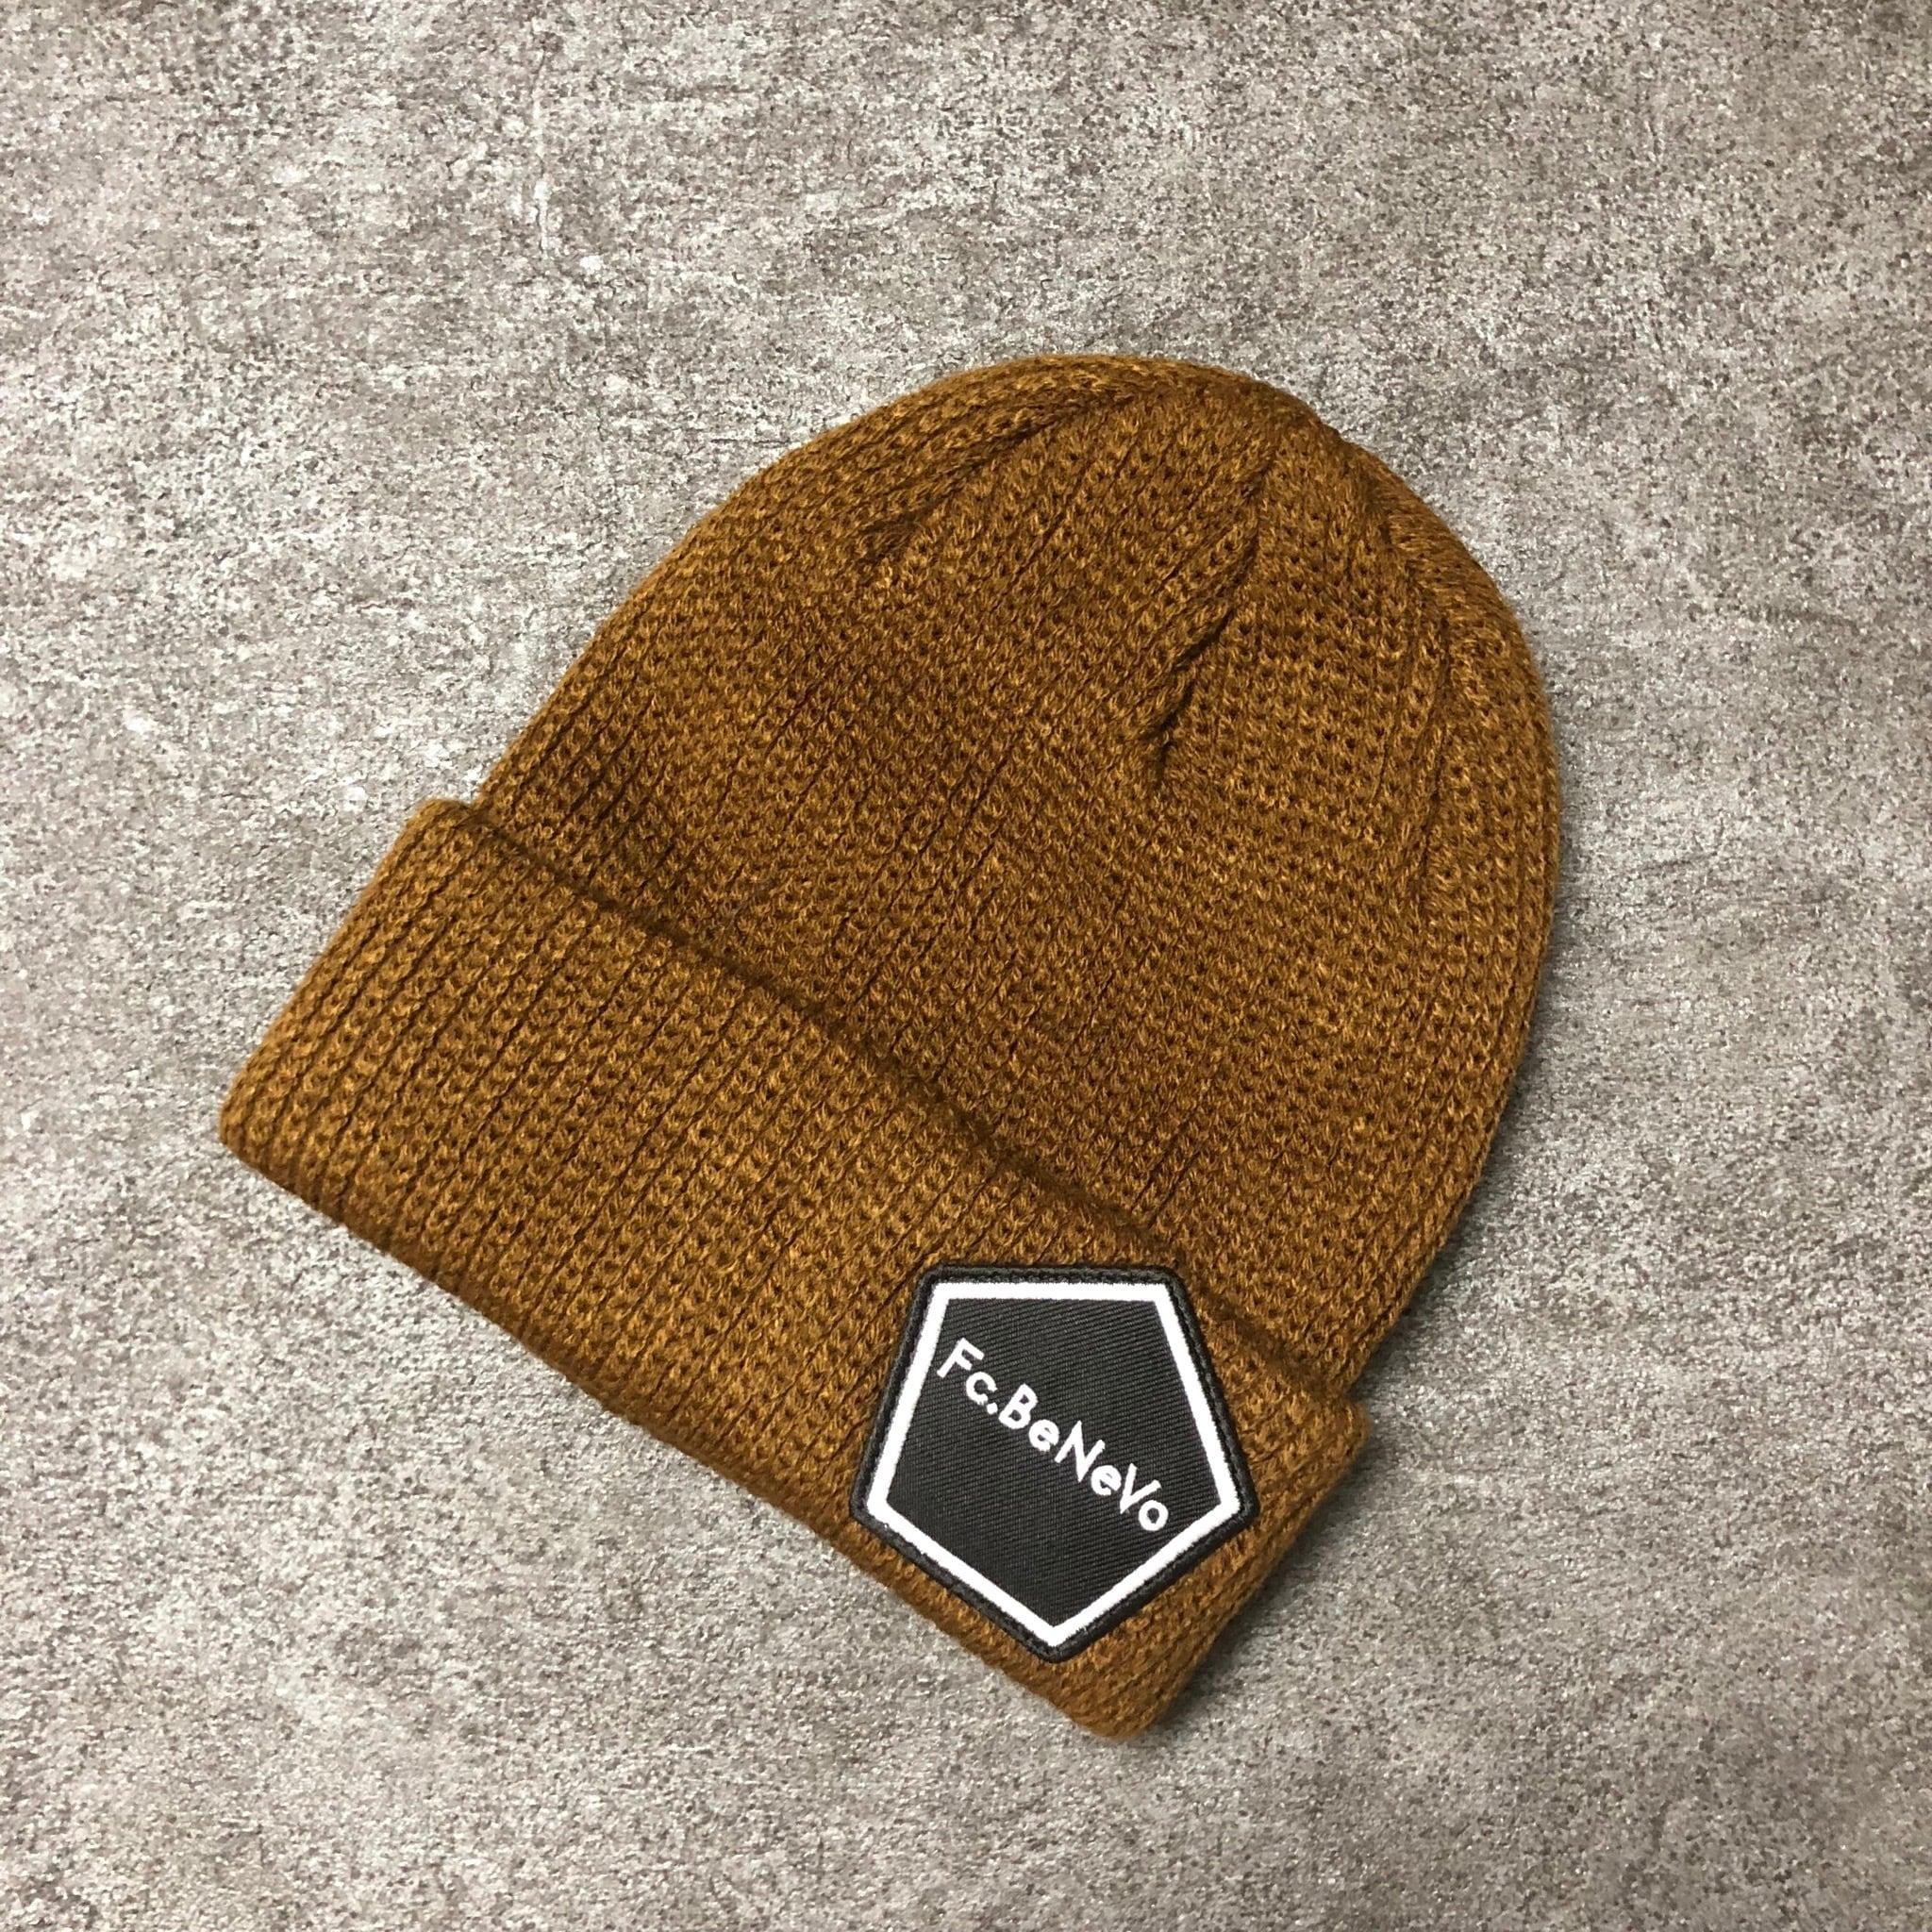 PENTAGON EMBLEM KNIT CAP (BROWN)